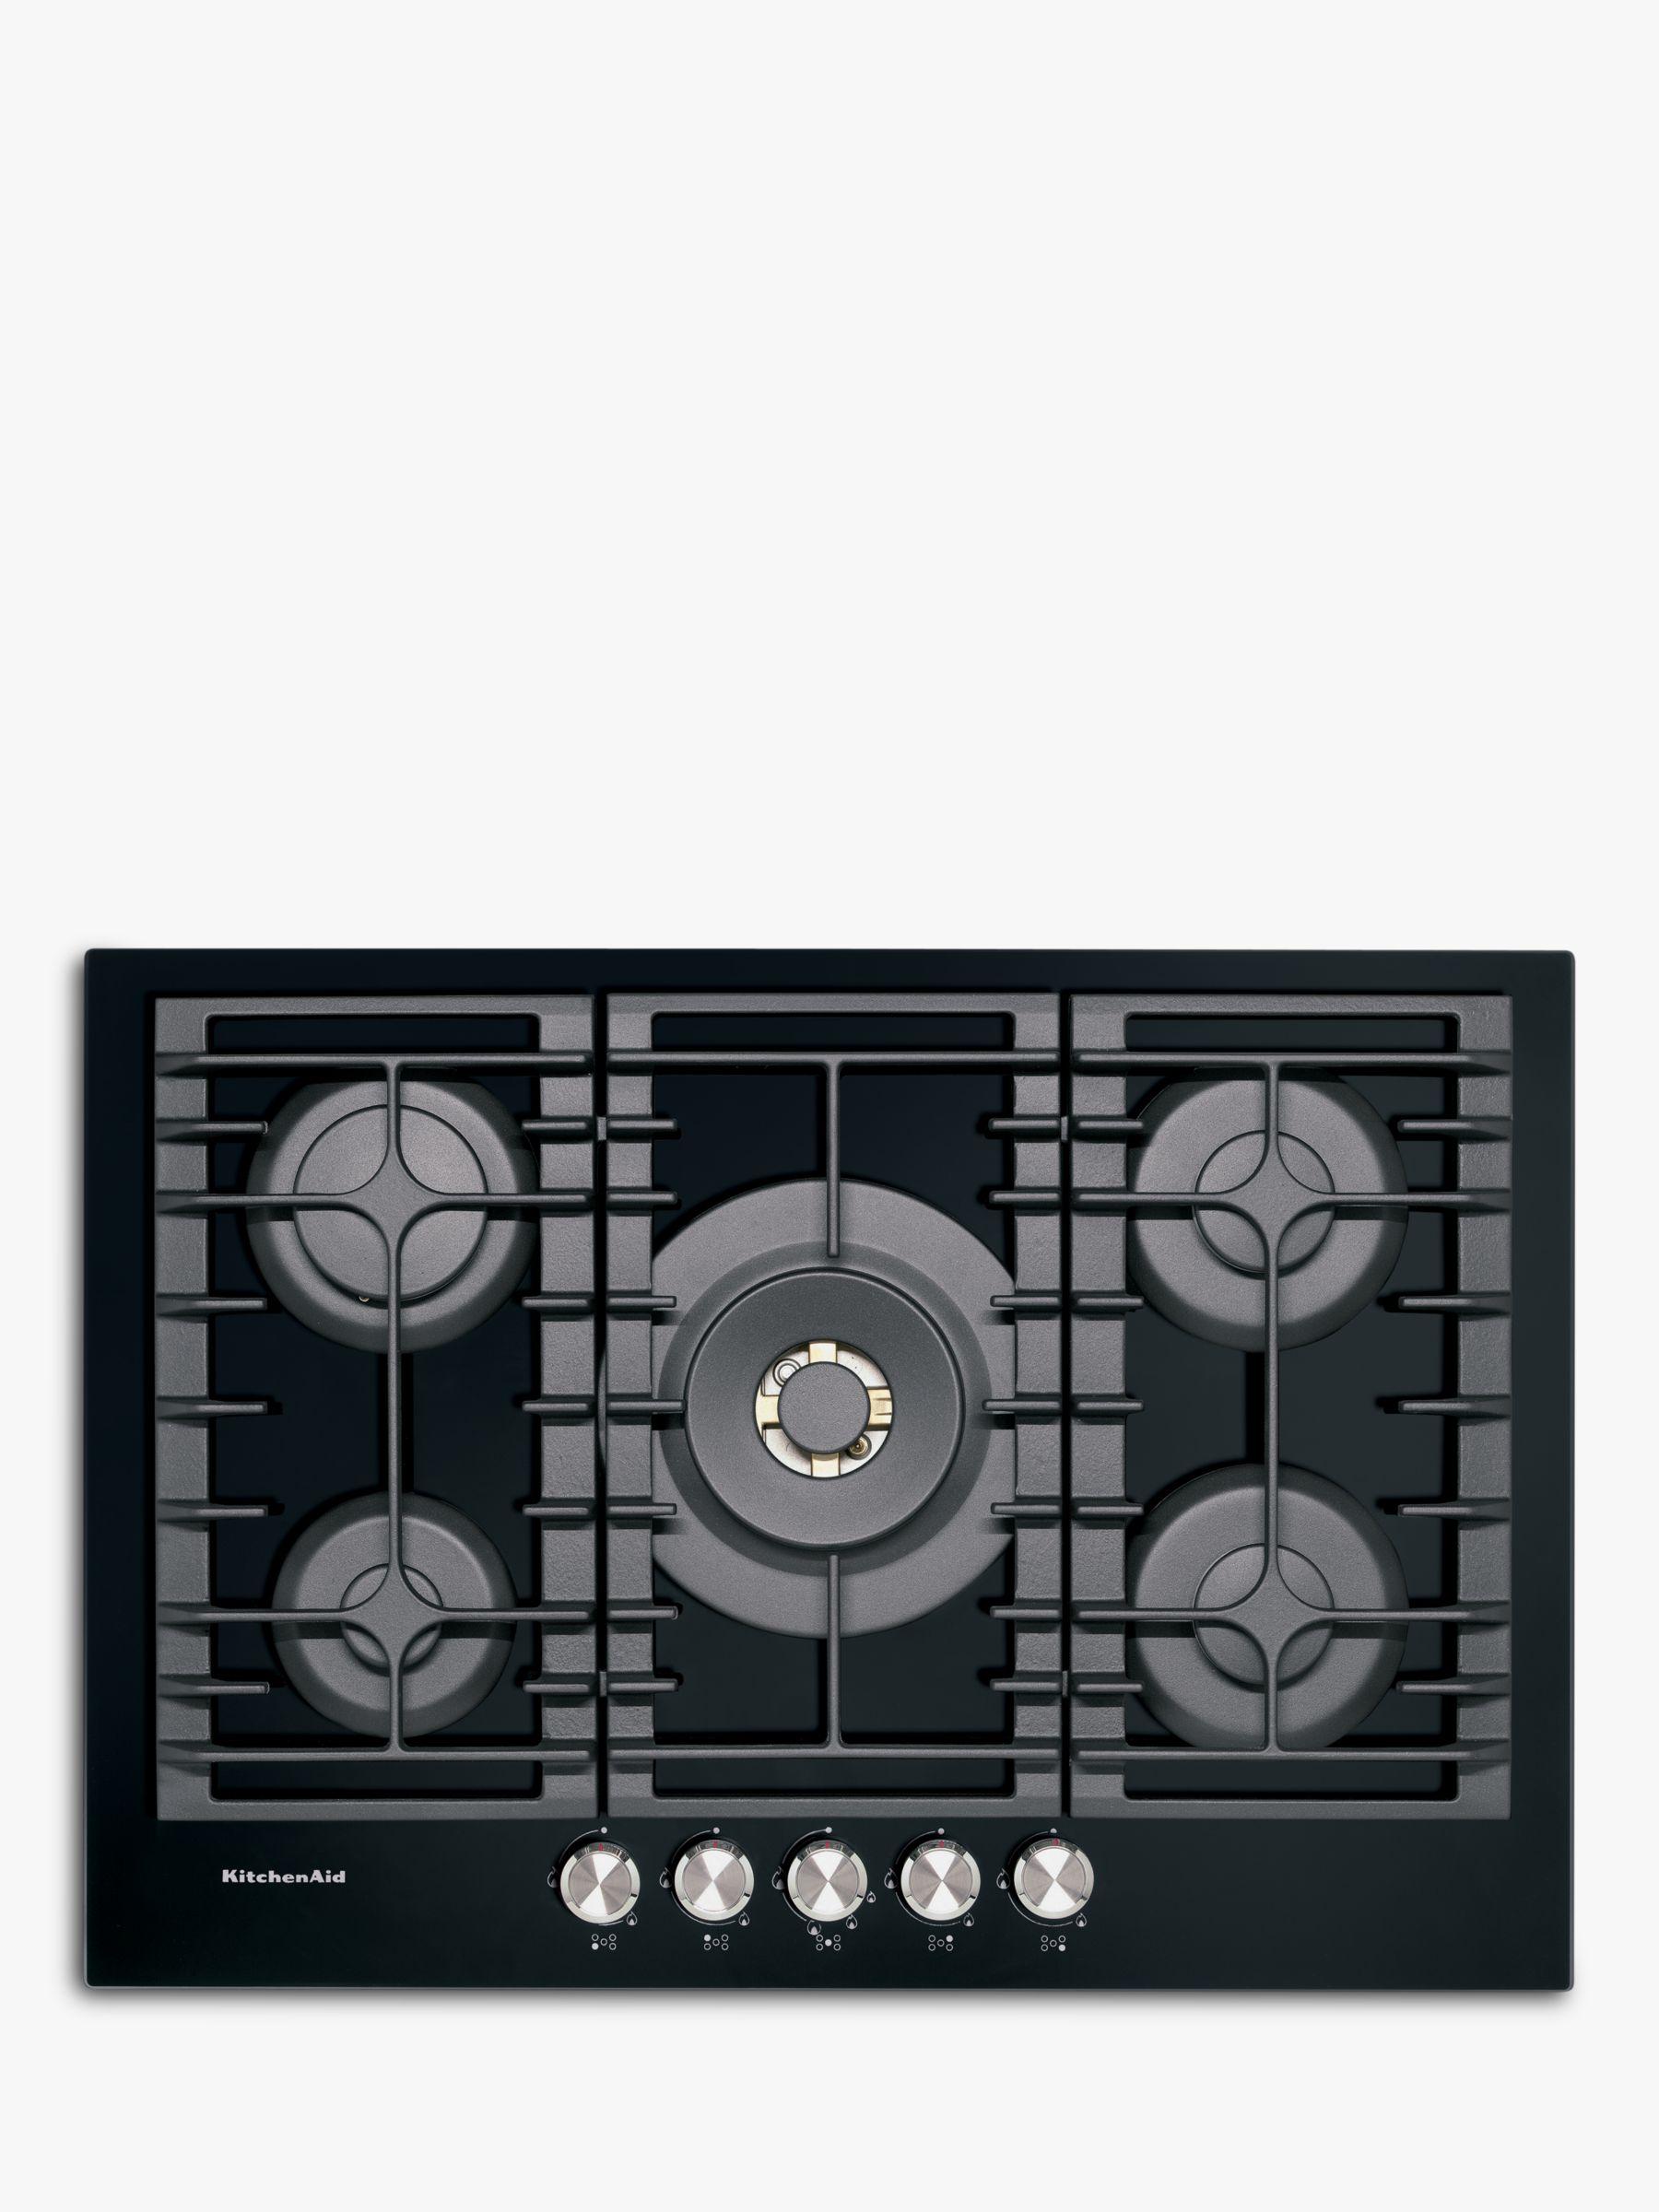 KitchenAid KitchenAid KHGD5 Integrated Gas Hob, Black / Inox